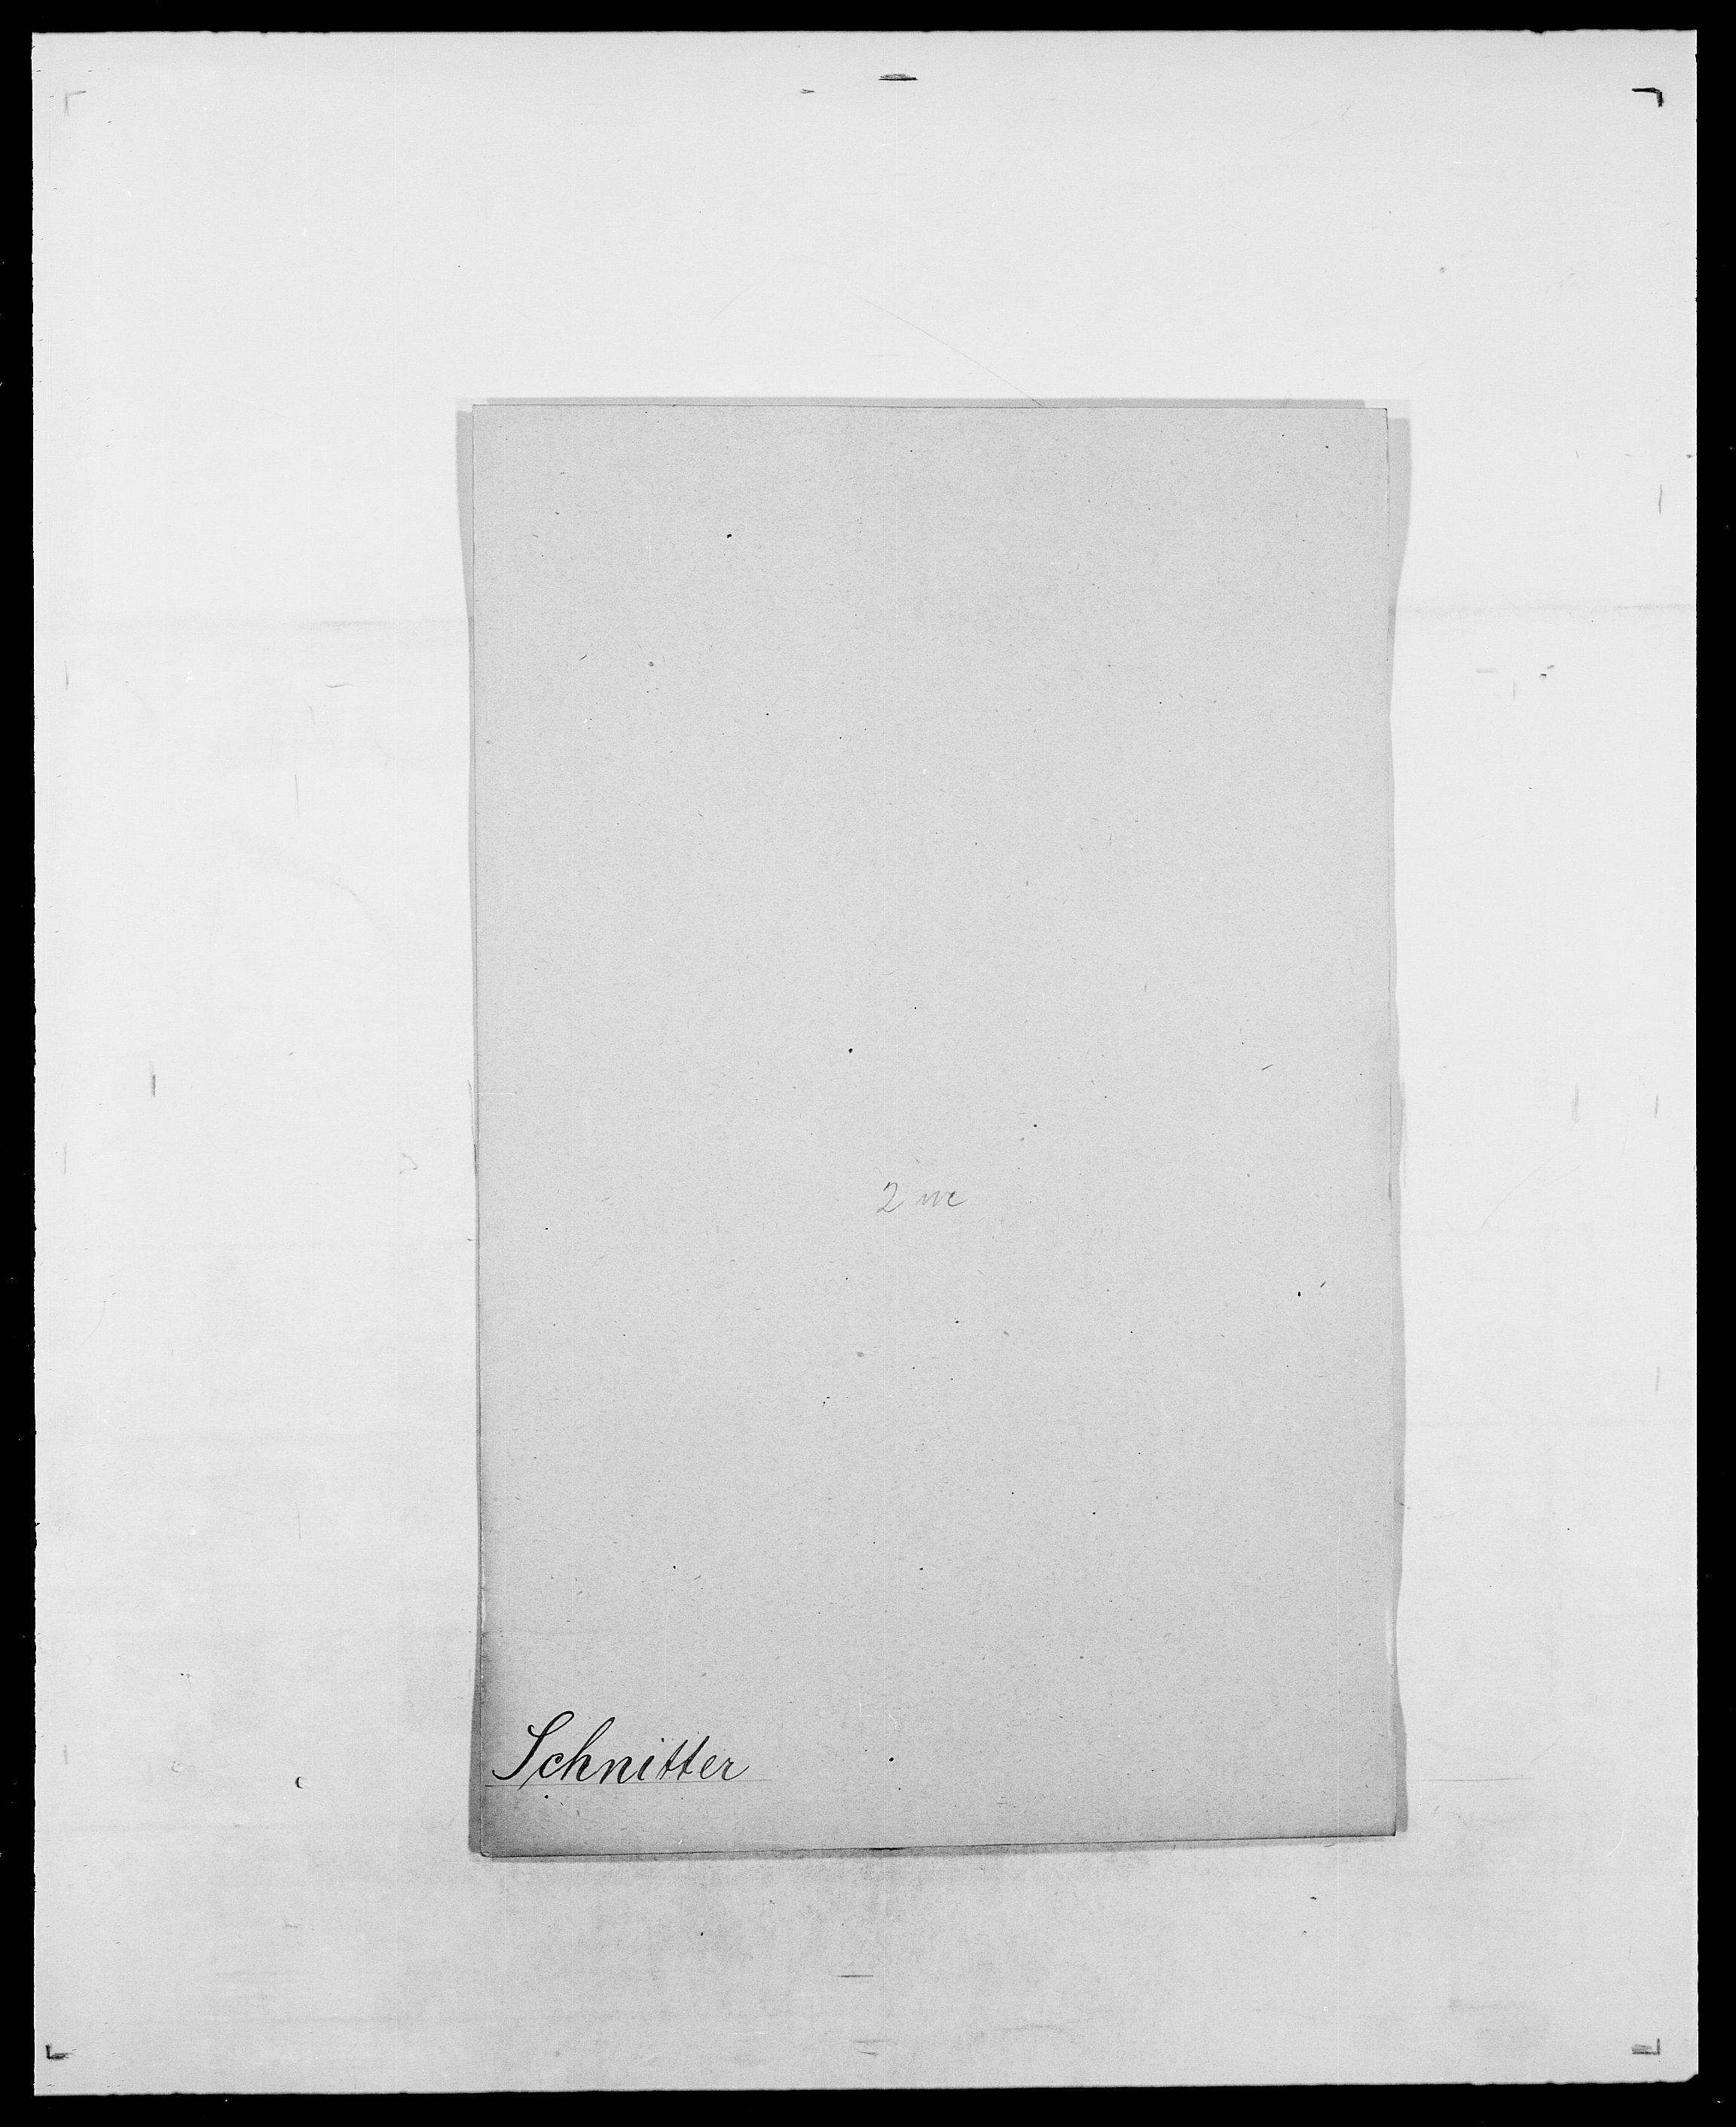 SAO, Delgobe, Charles Antoine - samling, D/Da/L0035: Schnabel - sjetman, s. 68